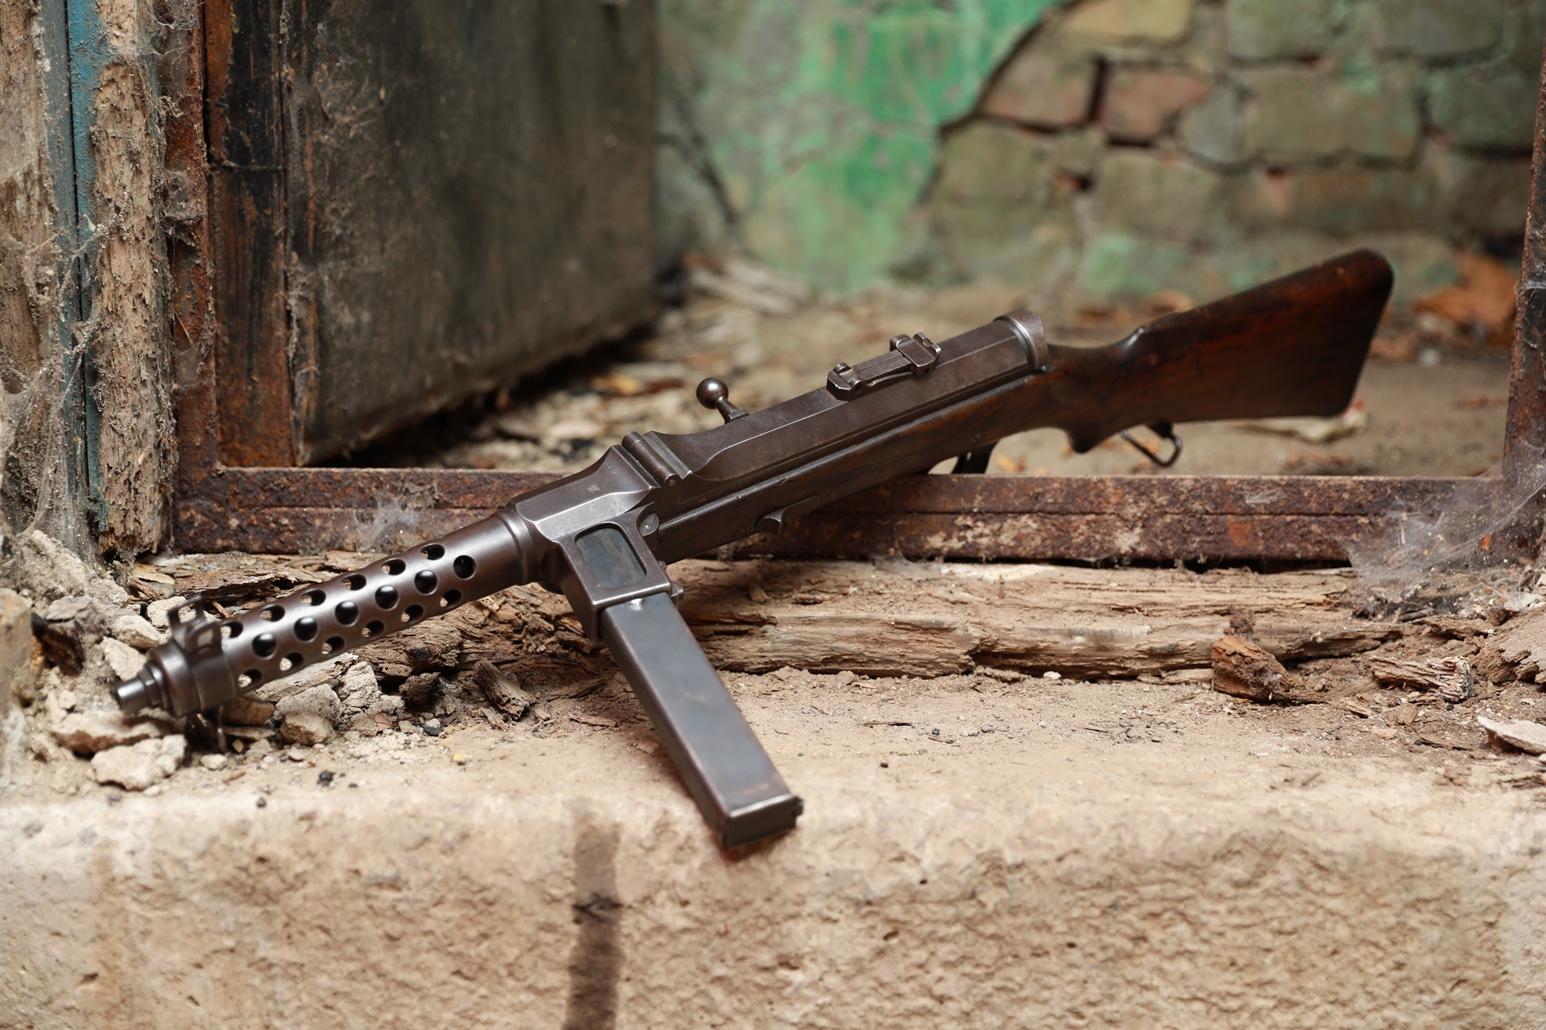 Фото Пистолет-пулемет Steyr-Solothurn S1-100 / MP34 #904